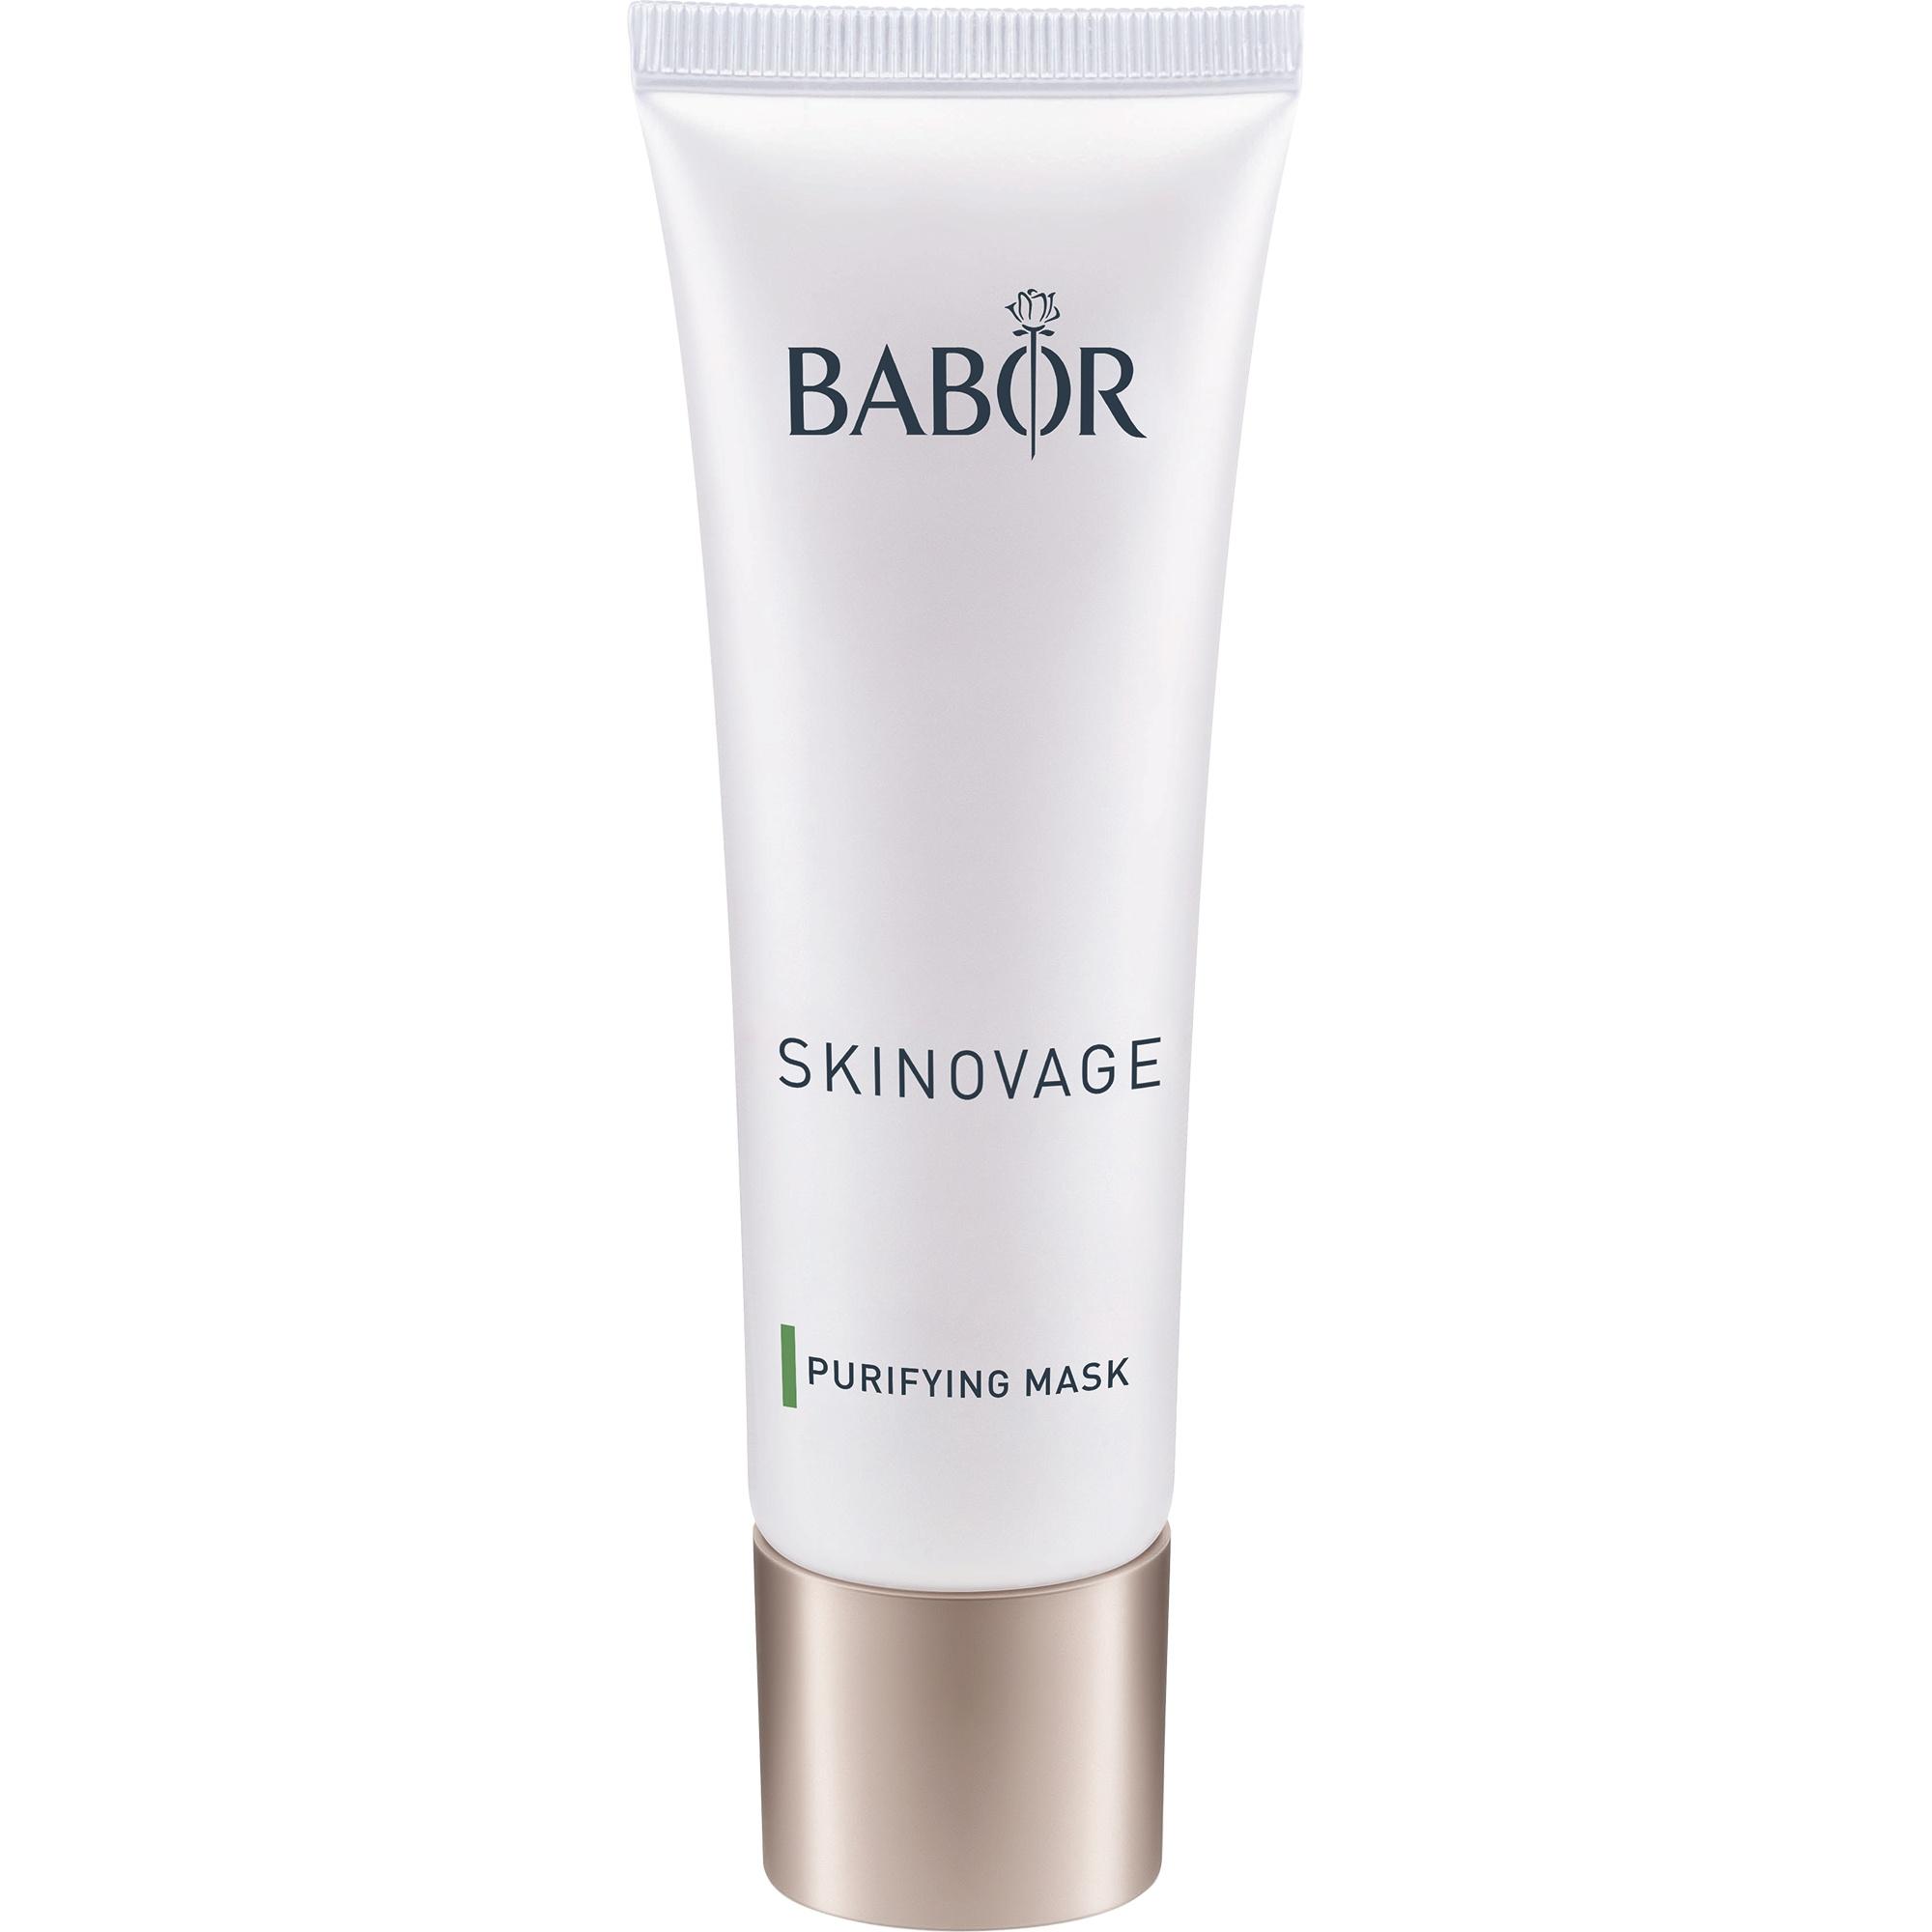 Skinovage Purifying Mask 50ml